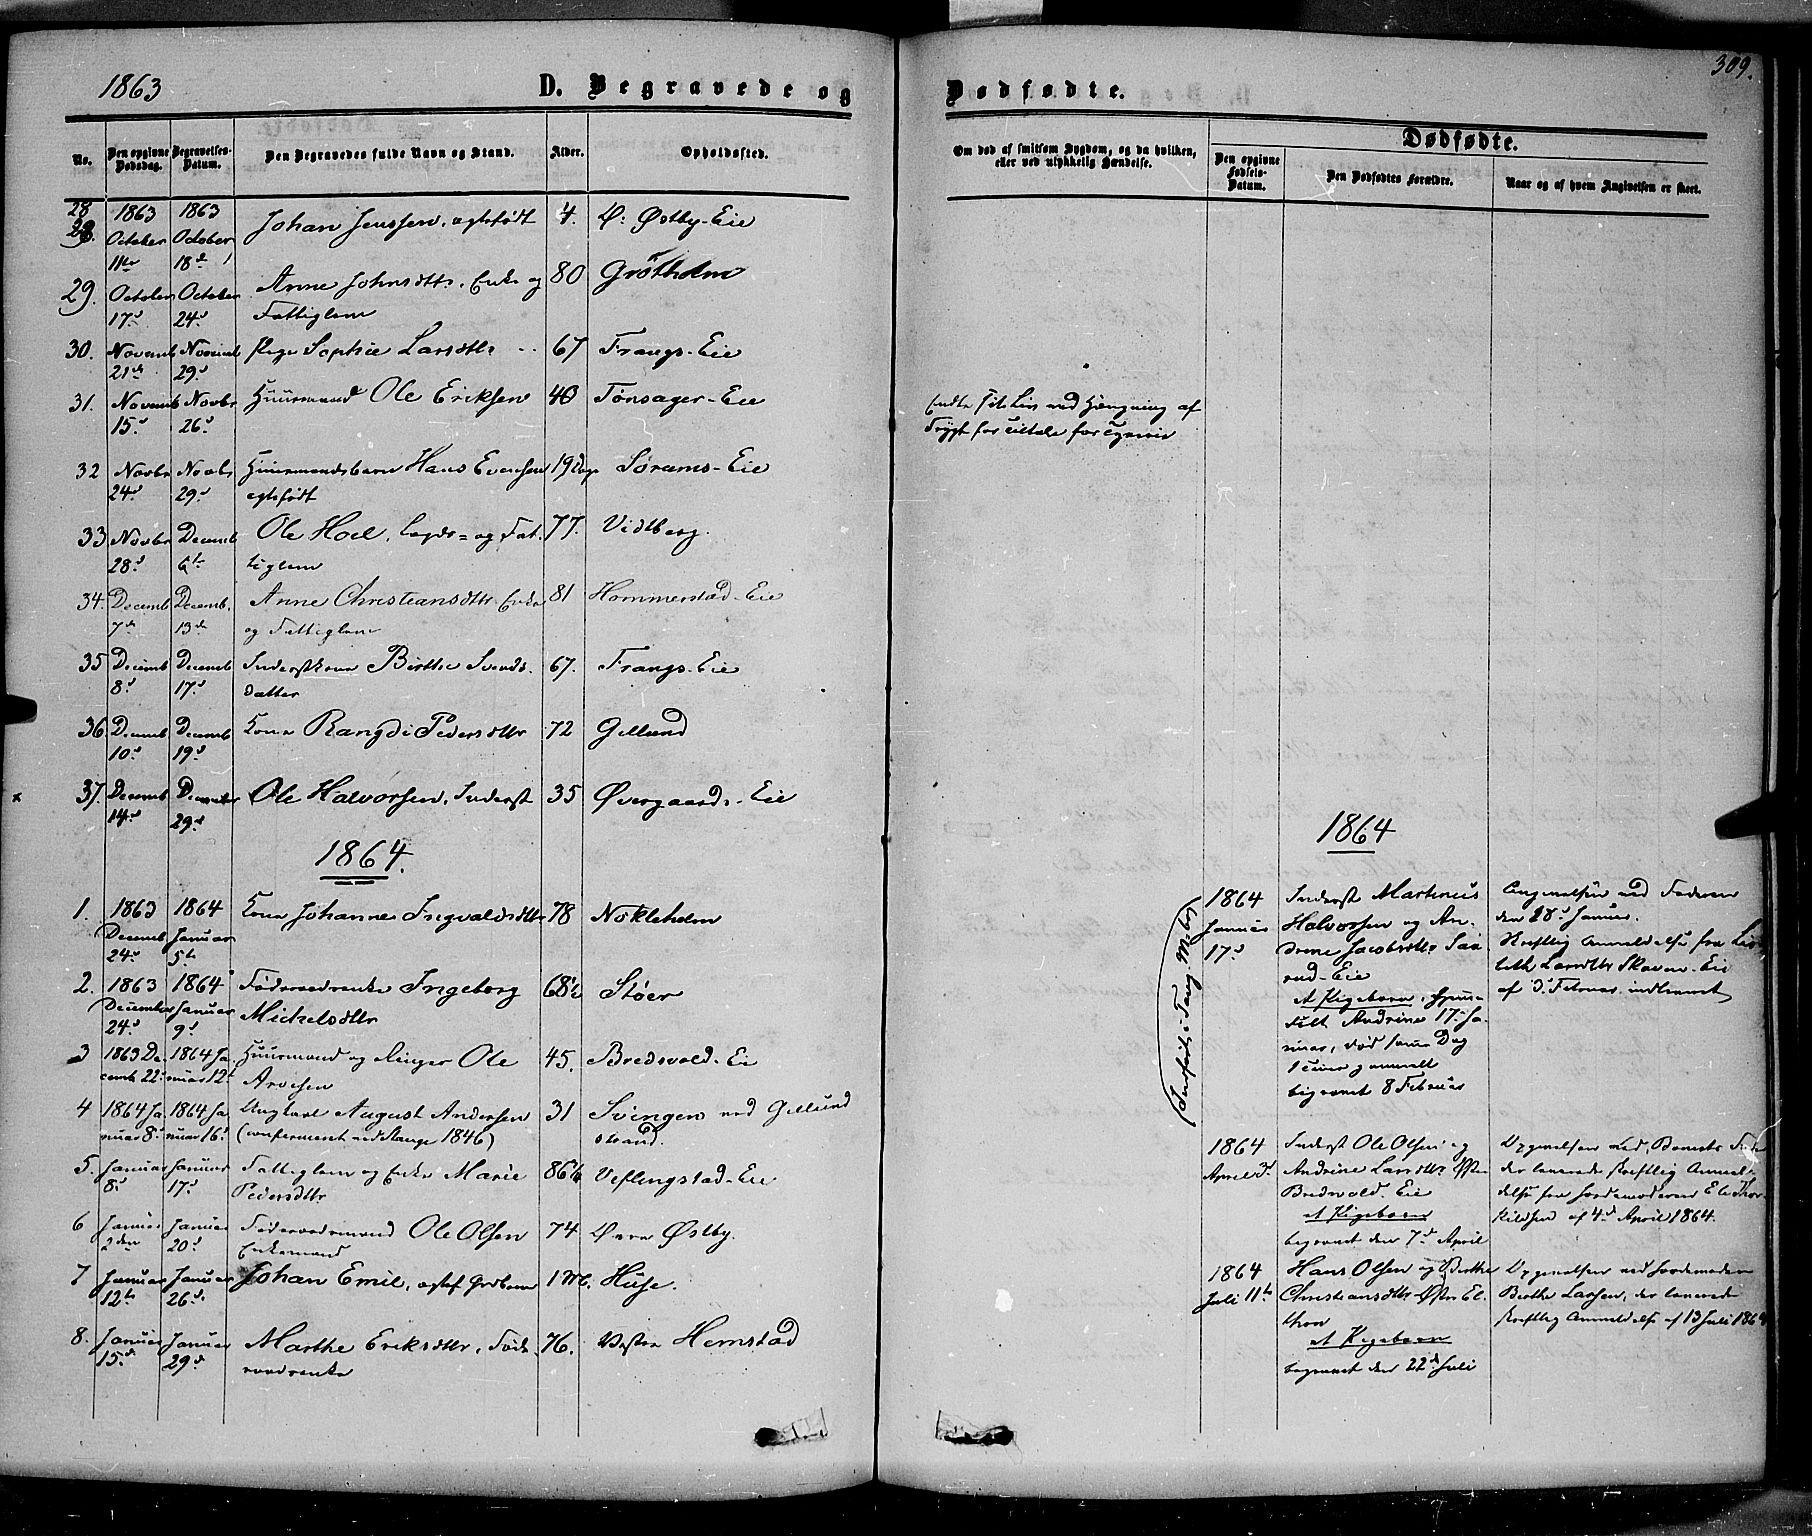 SAH, Stange prestekontor, K/L0013: Ministerialbok nr. 13, 1862-1879, s. 309